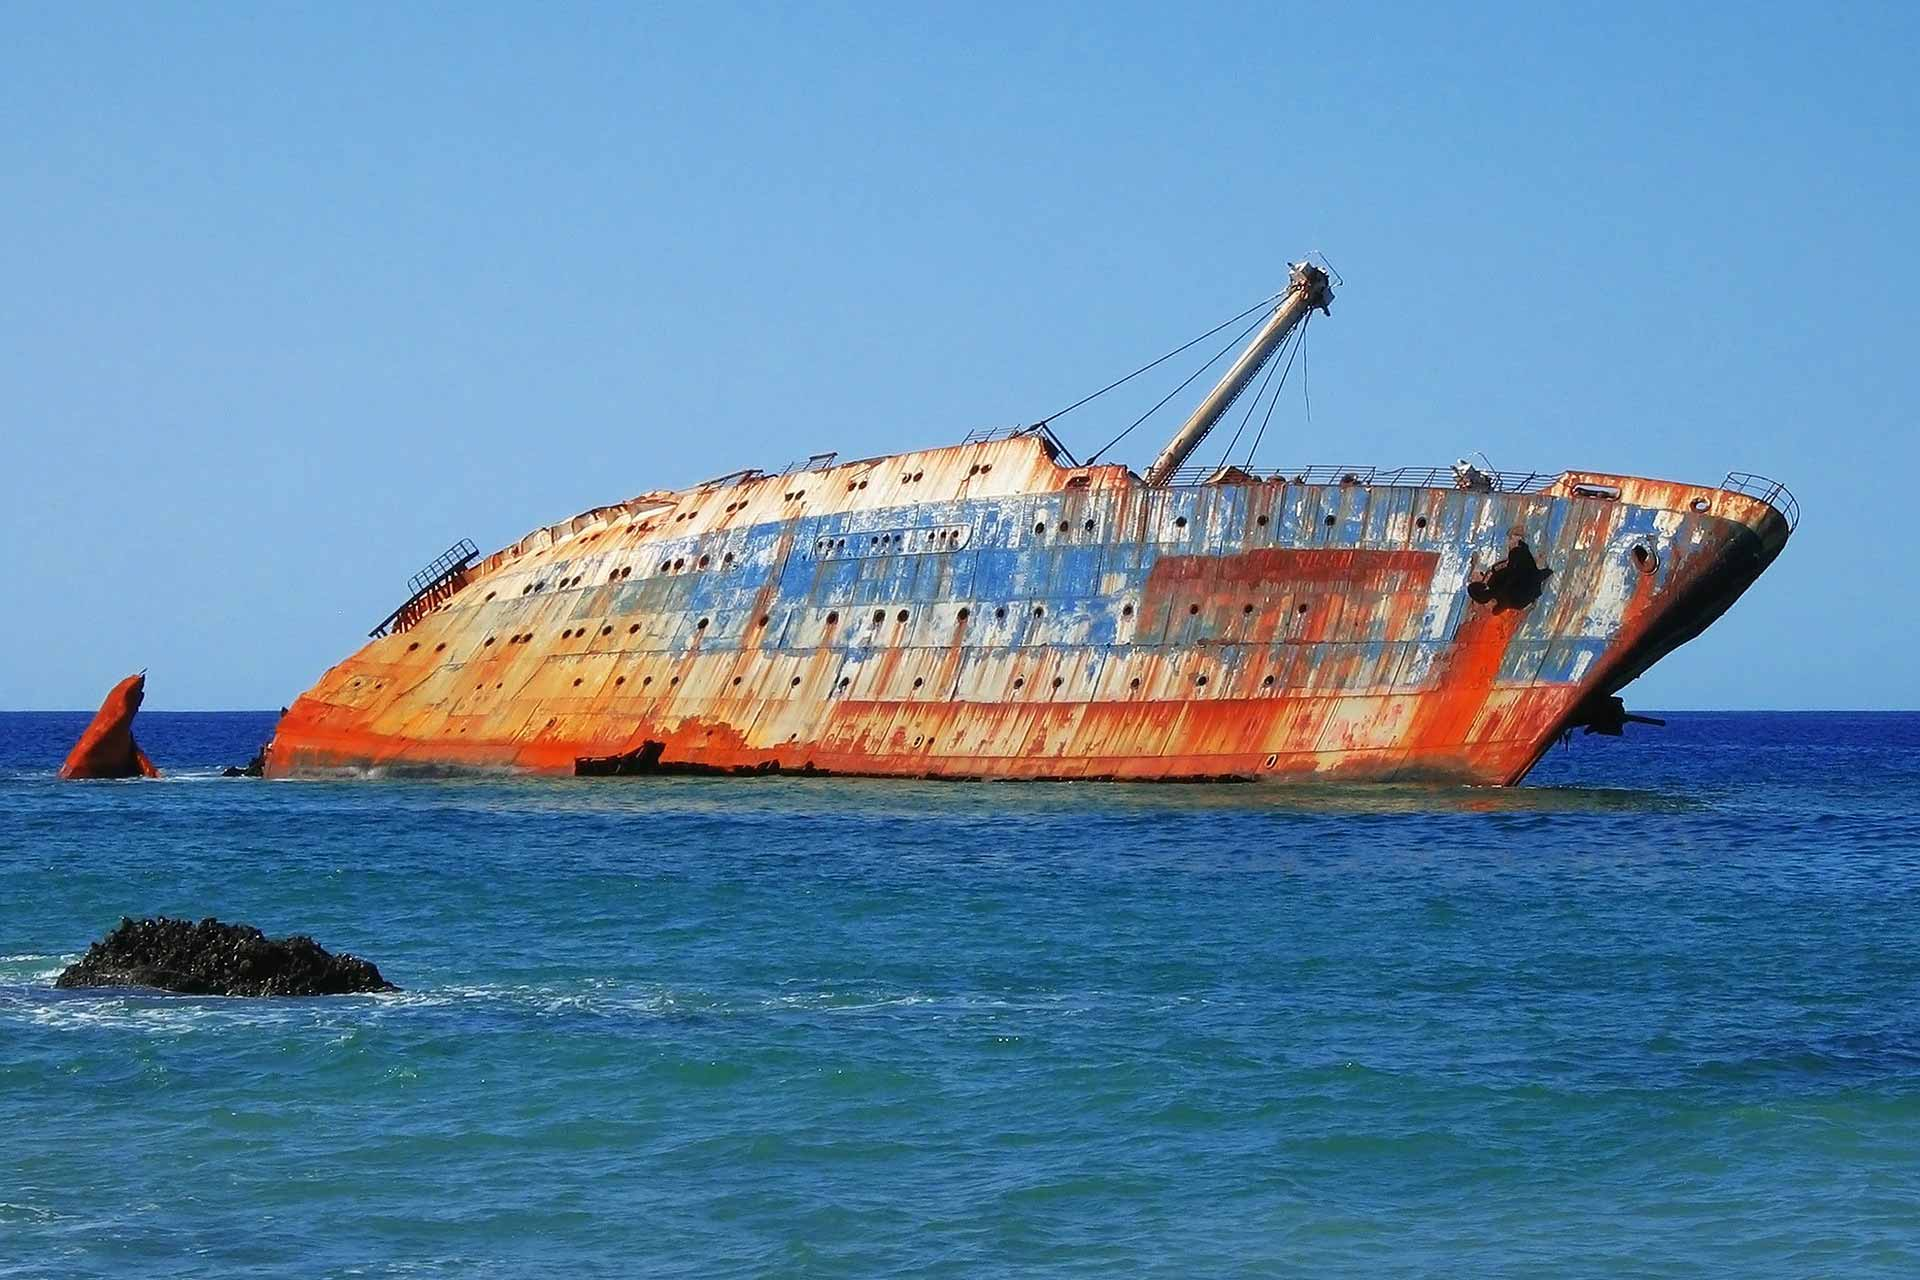 Canary Islands Shipwreck